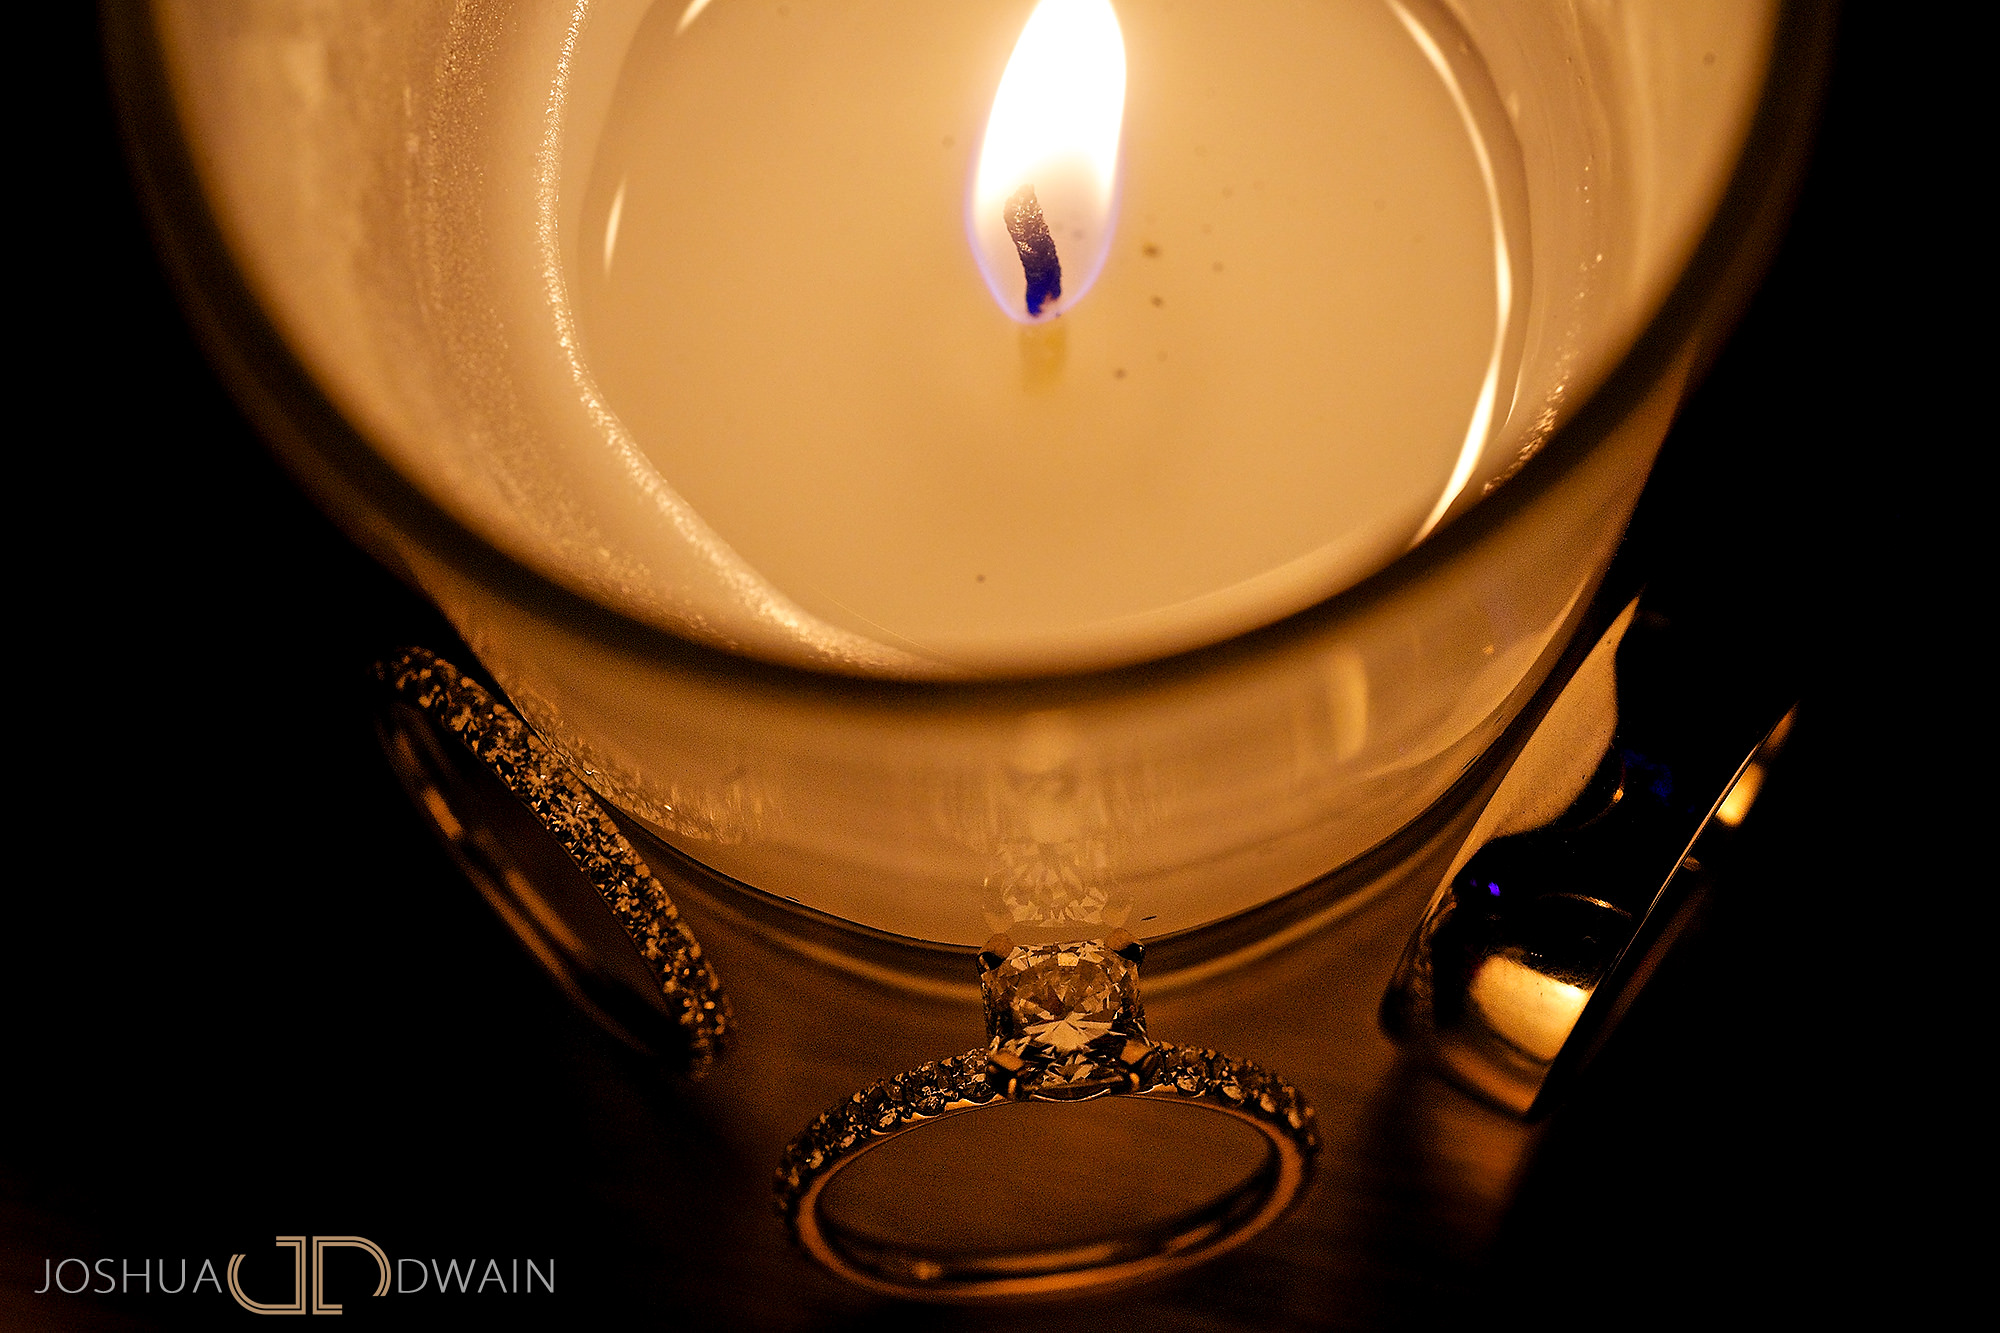 tiffany-udo-019-tendenza-philadelphia-pa-wedding-photographer-joshua-dwain-photography-